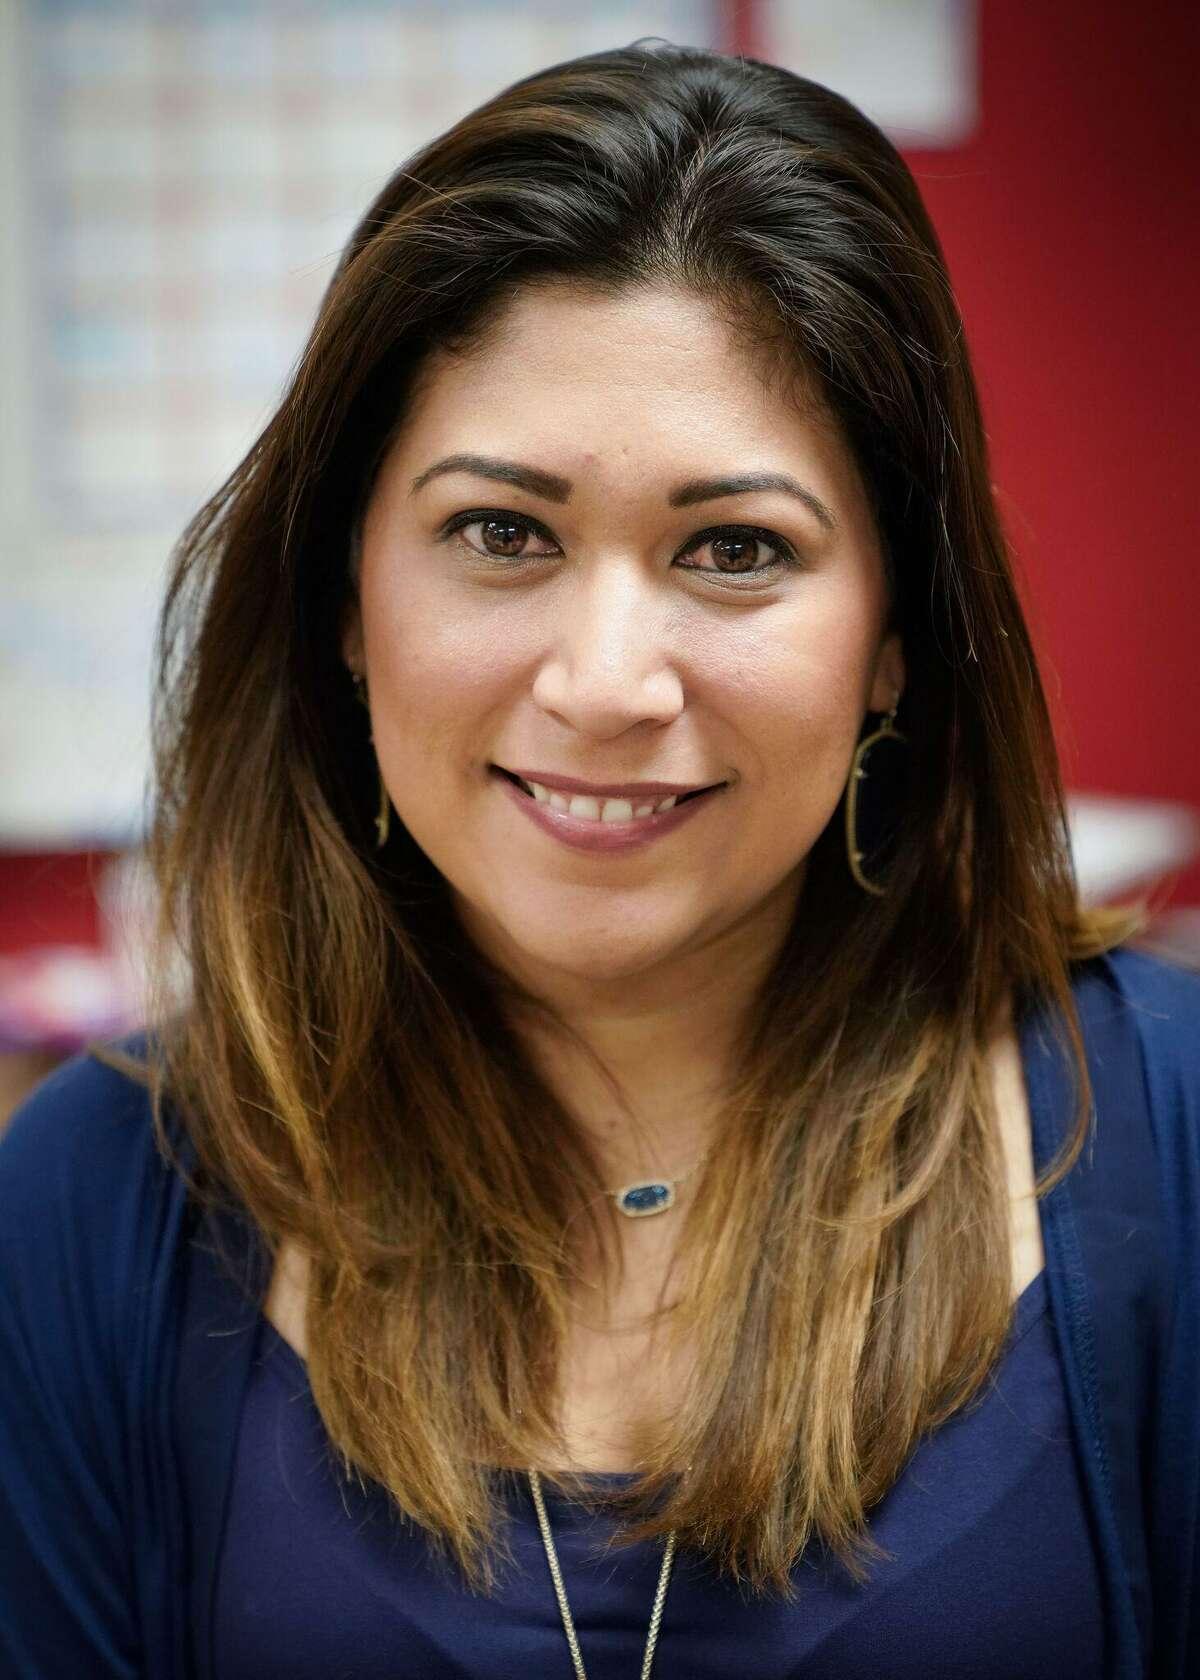 Southwest ISD's Denisse Hernandez earned a Rising Star award from the H-E-B Excellence in Education Awards held Sunday in Houston.